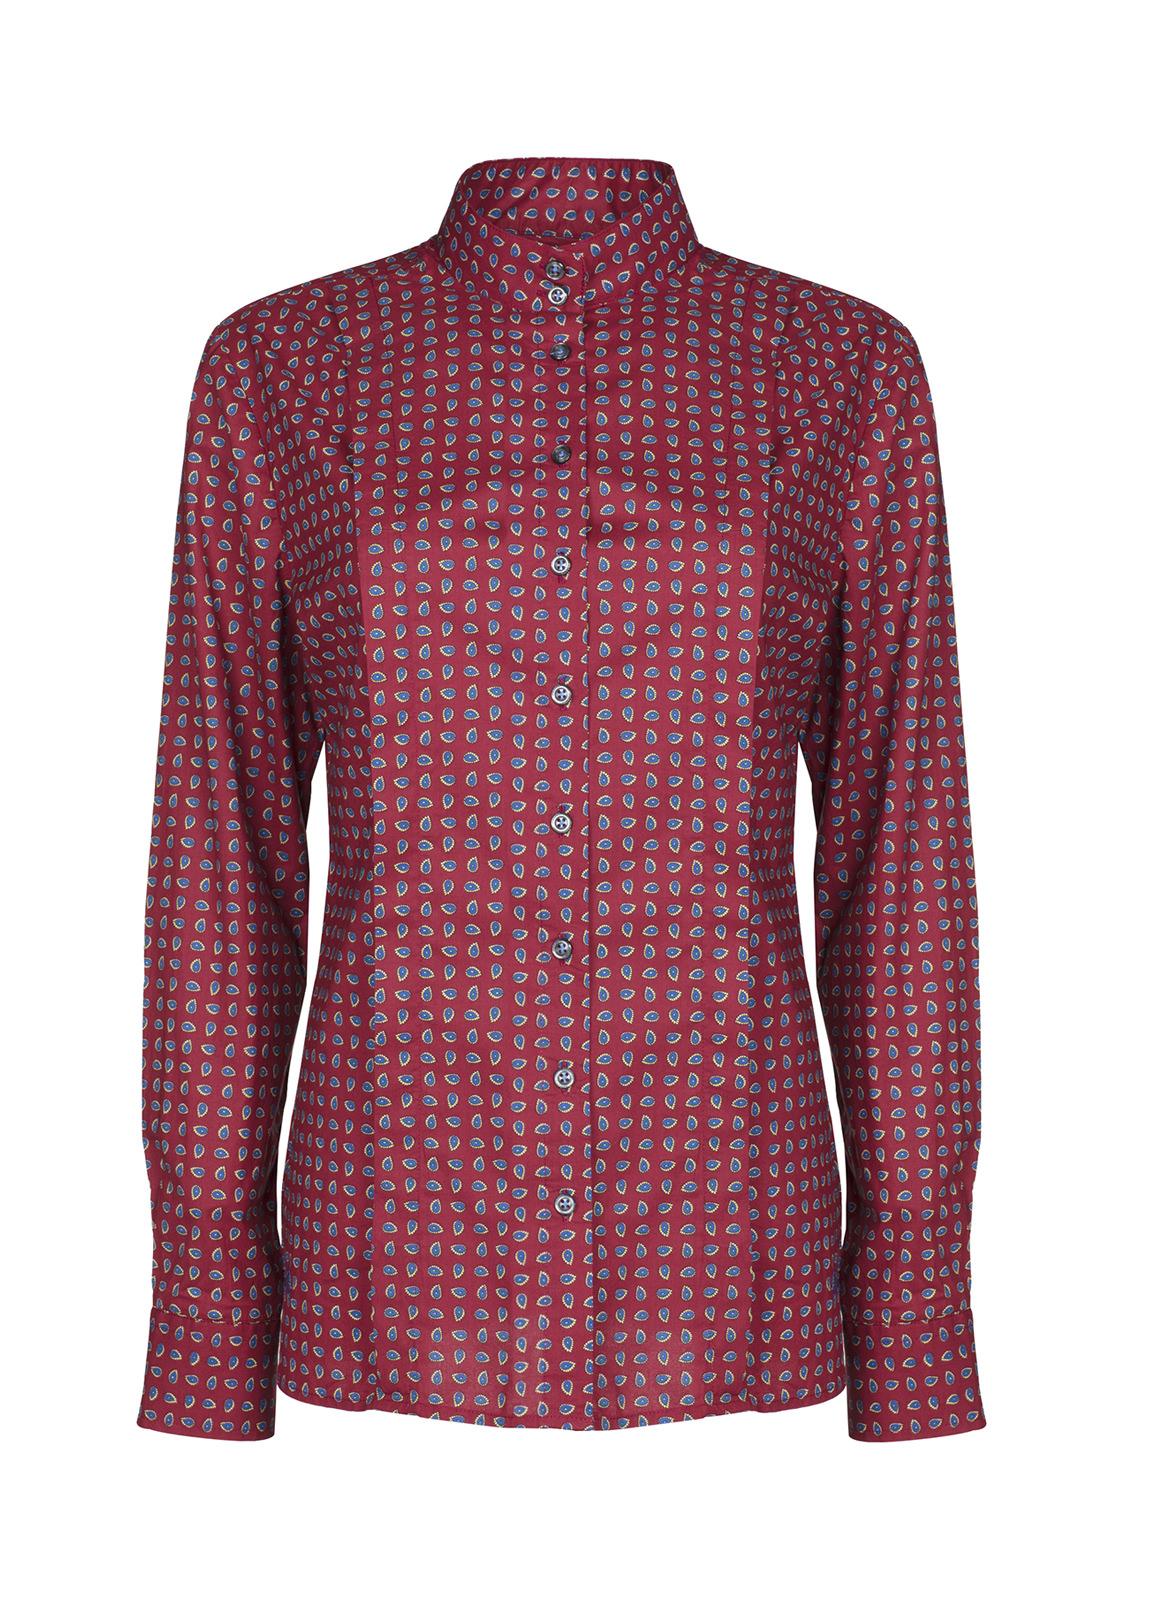 Dubarry_ Snapdragon Shirt - Malbec_Image_2